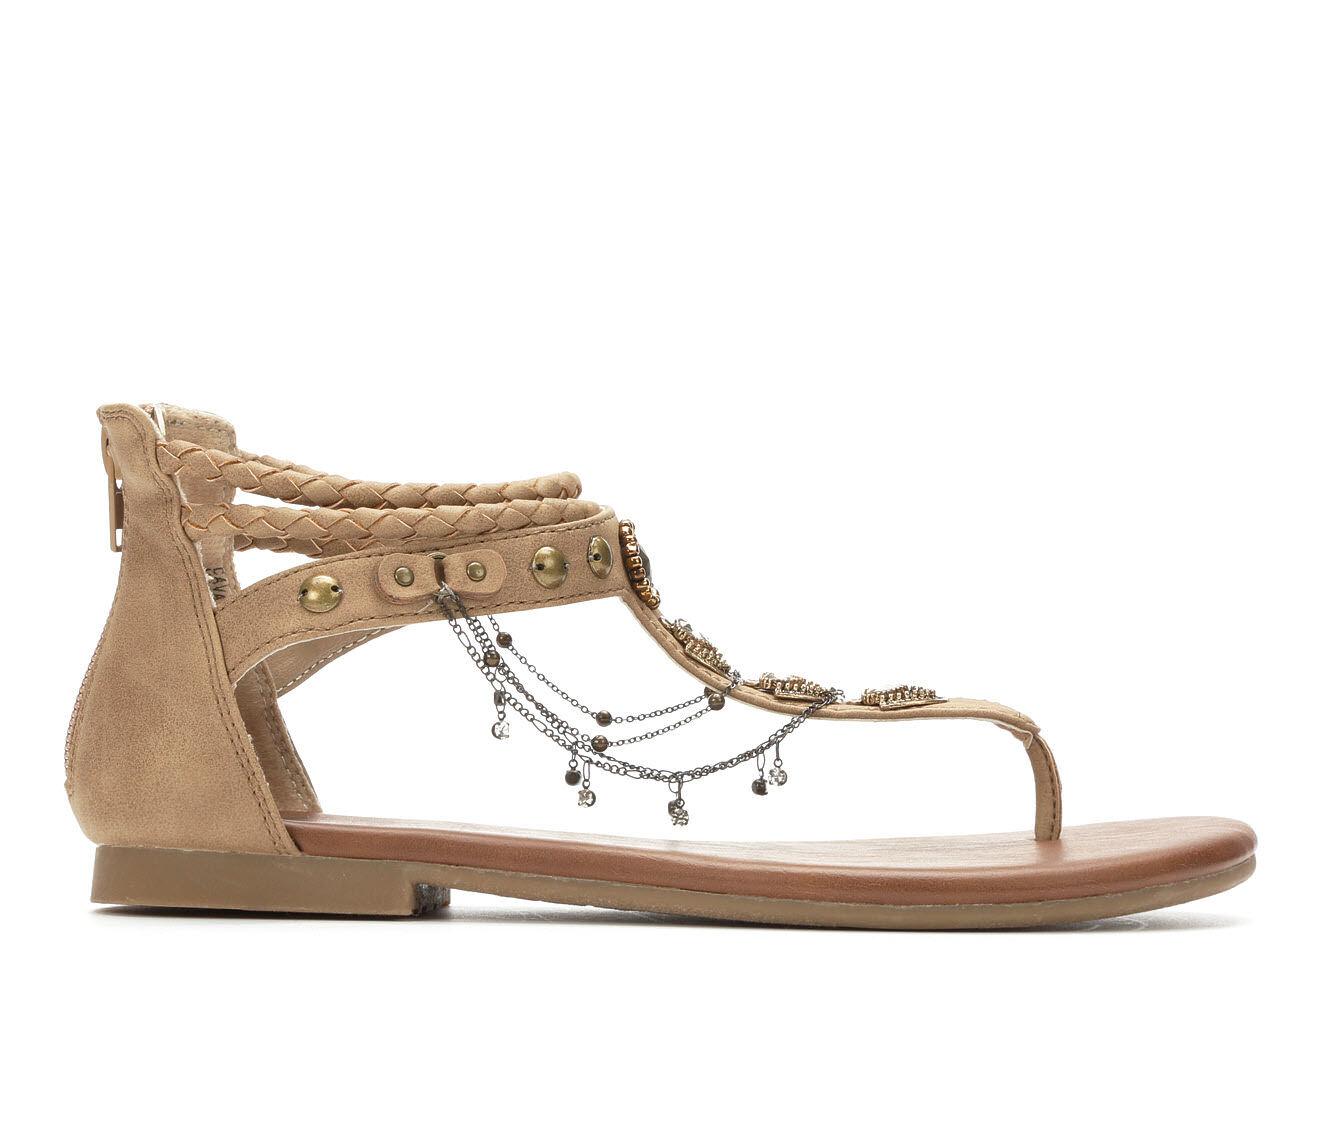 Trend Mark Women's Jellypop Cava Flat Sandals Sand Distressed